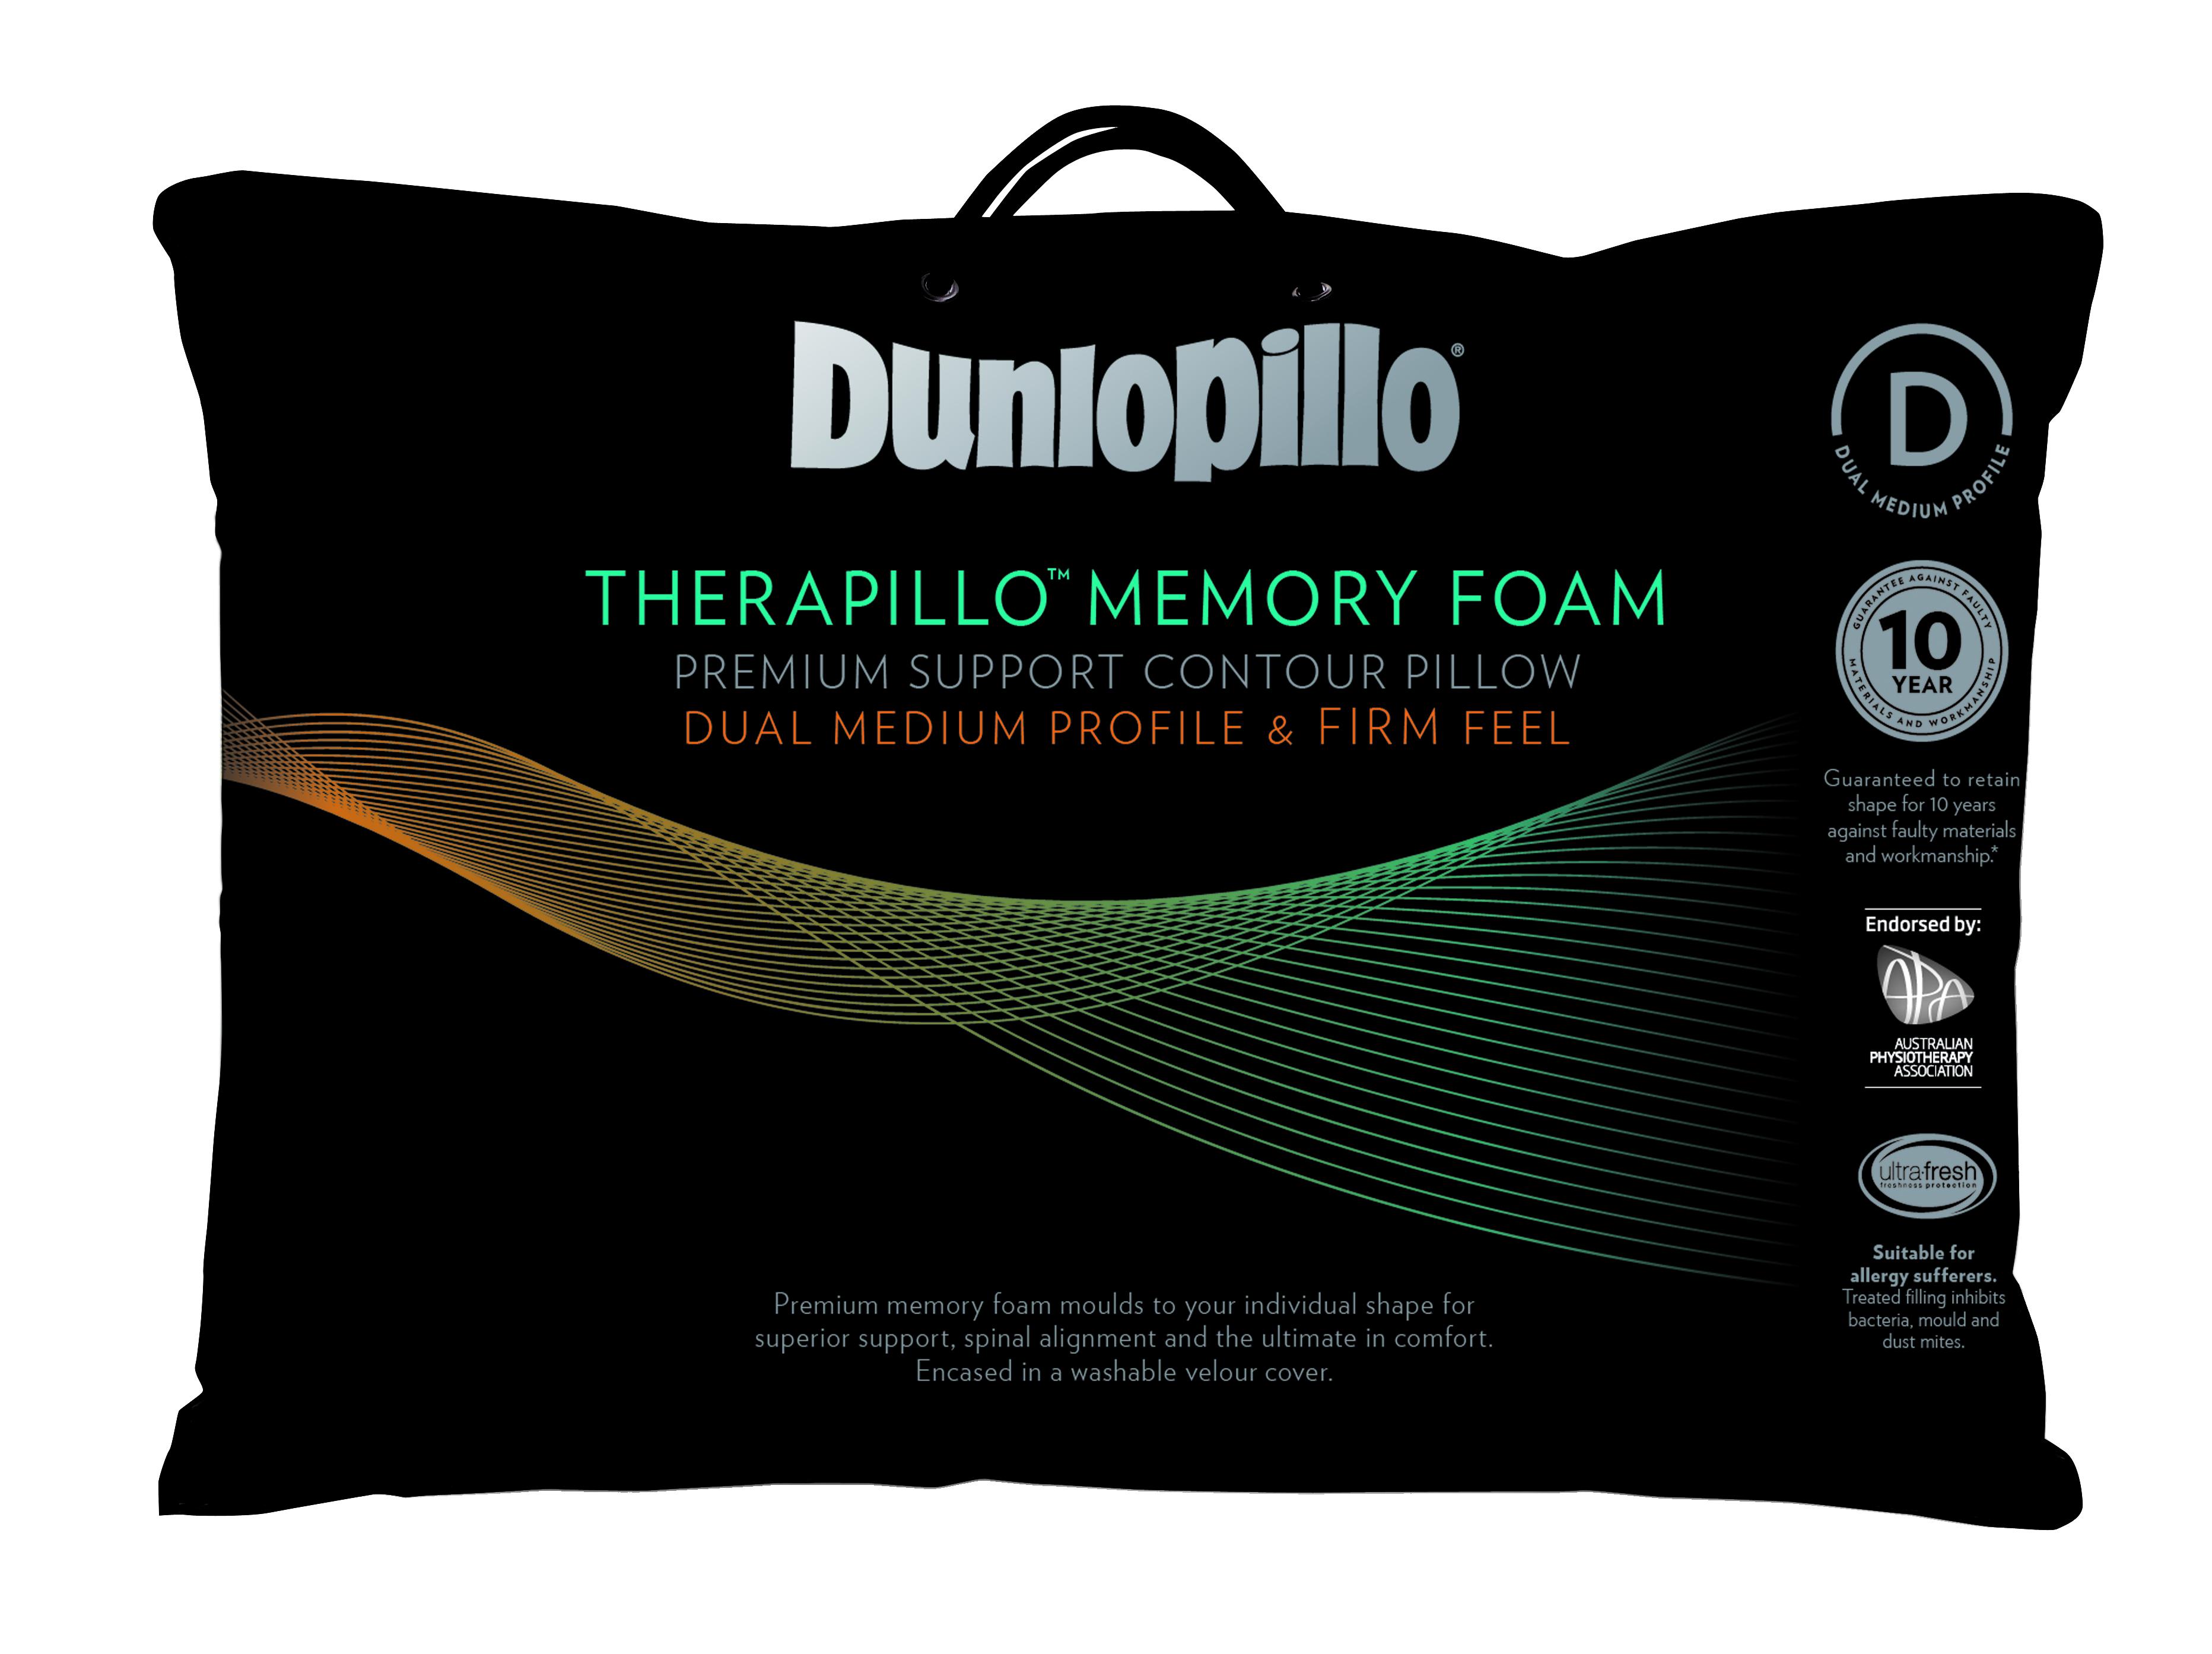 Dunlopillo Premium Memory Foam Pillow Contoured High Profile